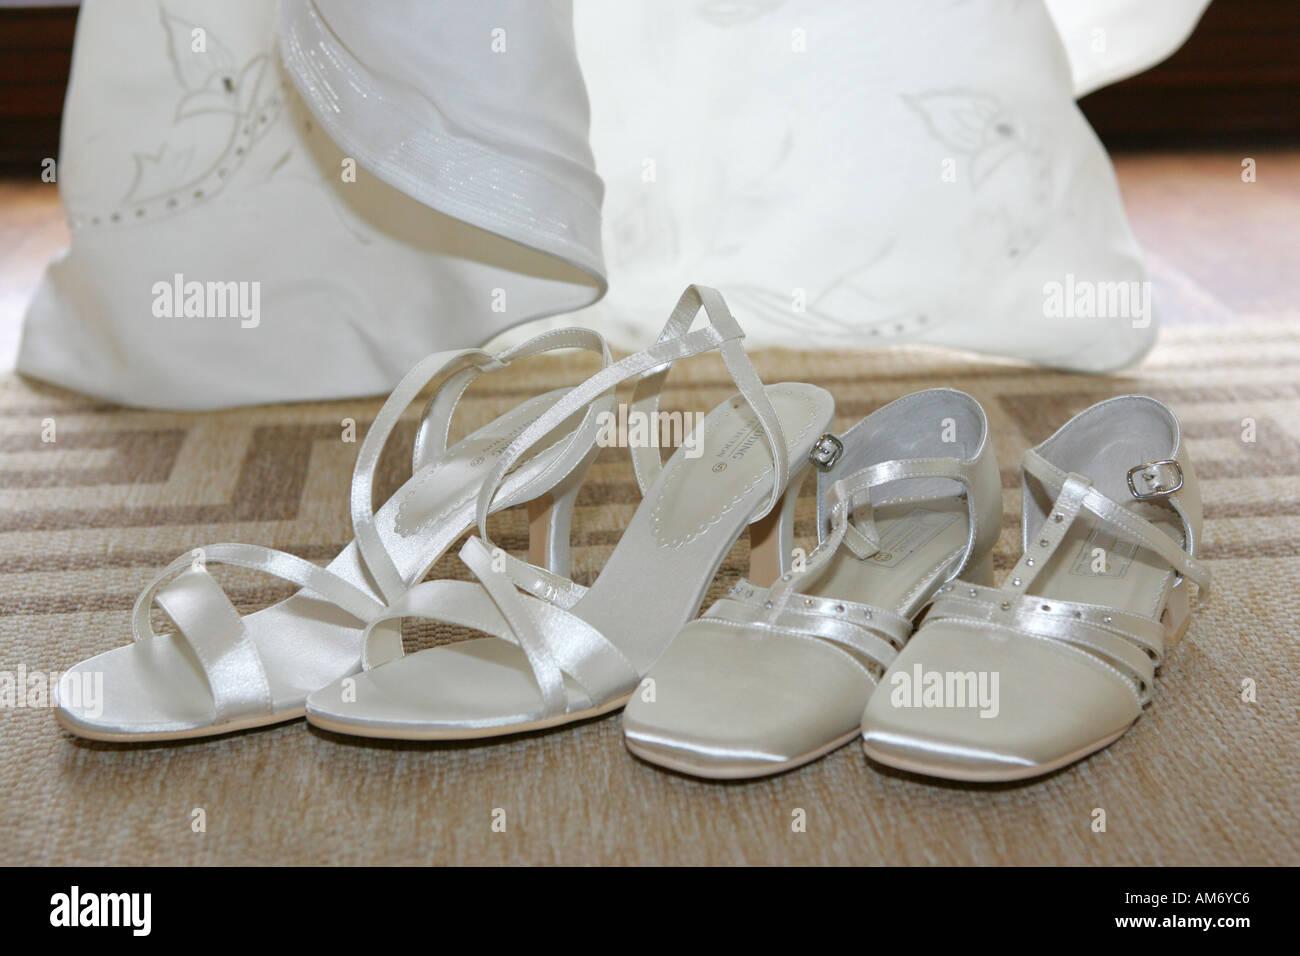 bridesmaid white background stockfotos bridesmaid white. Black Bedroom Furniture Sets. Home Design Ideas